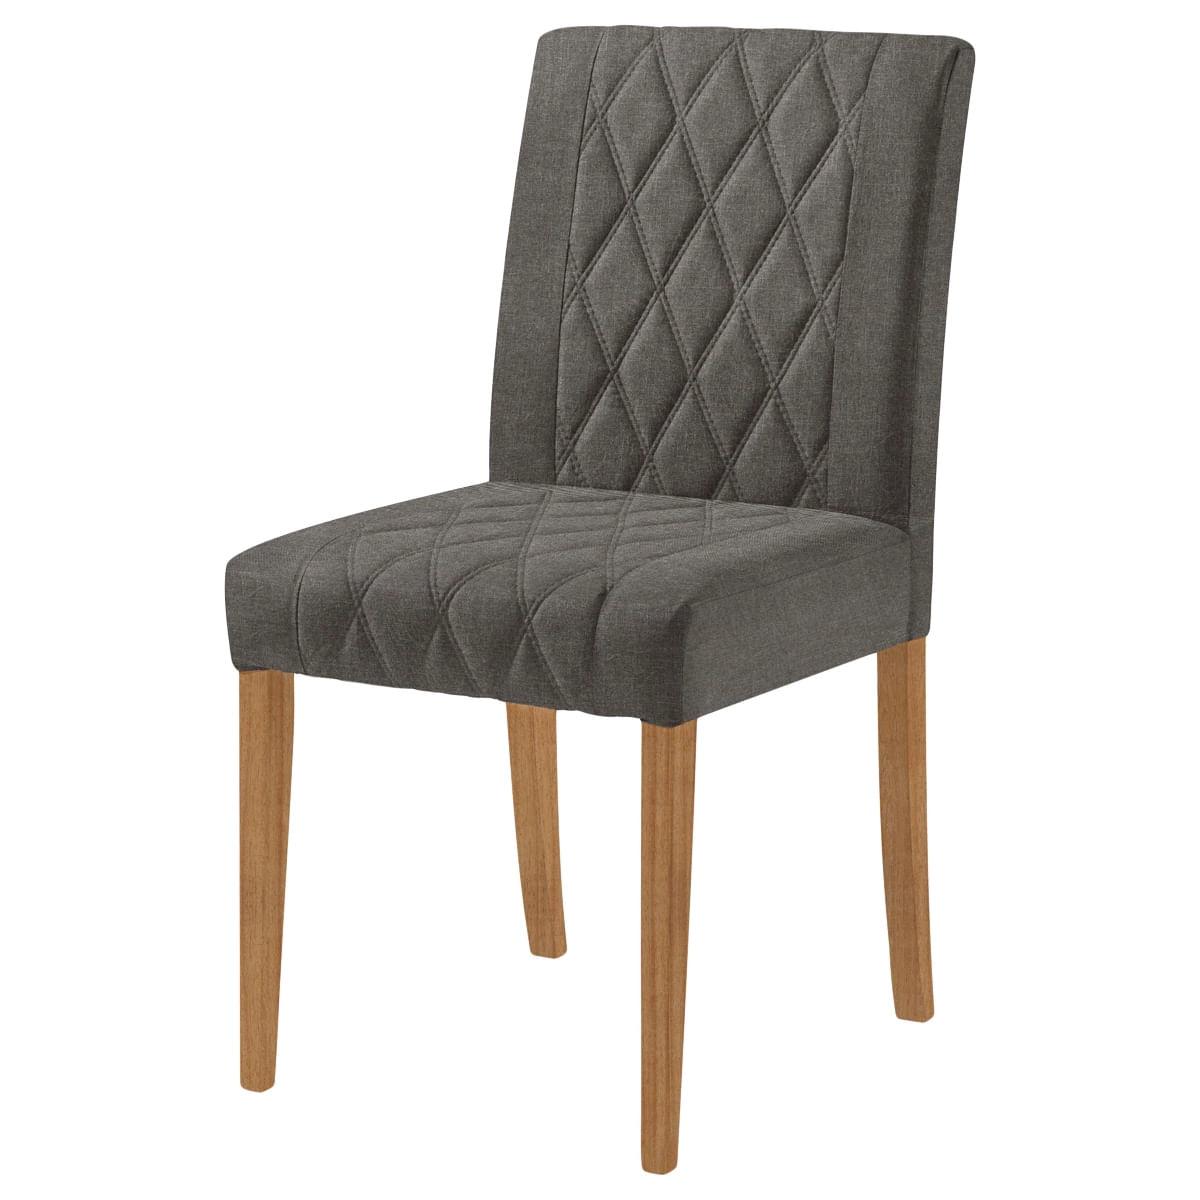 Cadeira Menta Assento cor Cinza com Base Nogal - 46449